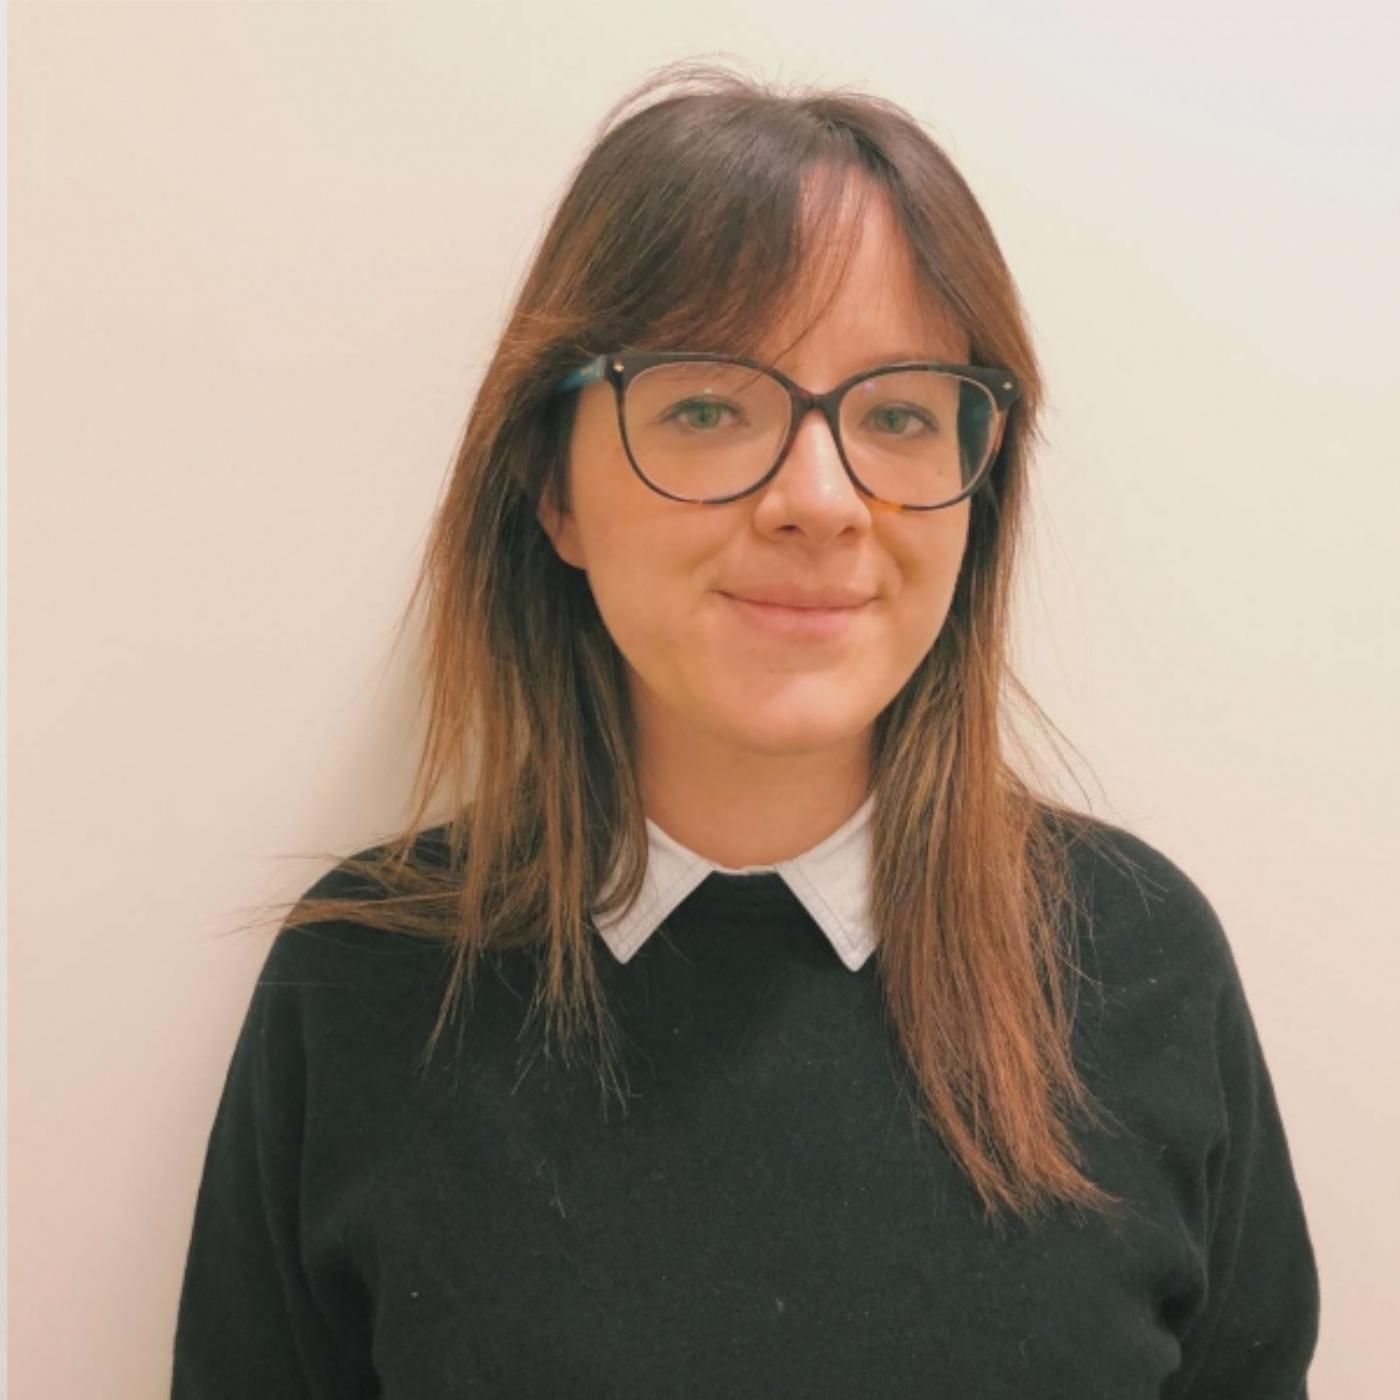 Laura Re Fraschini